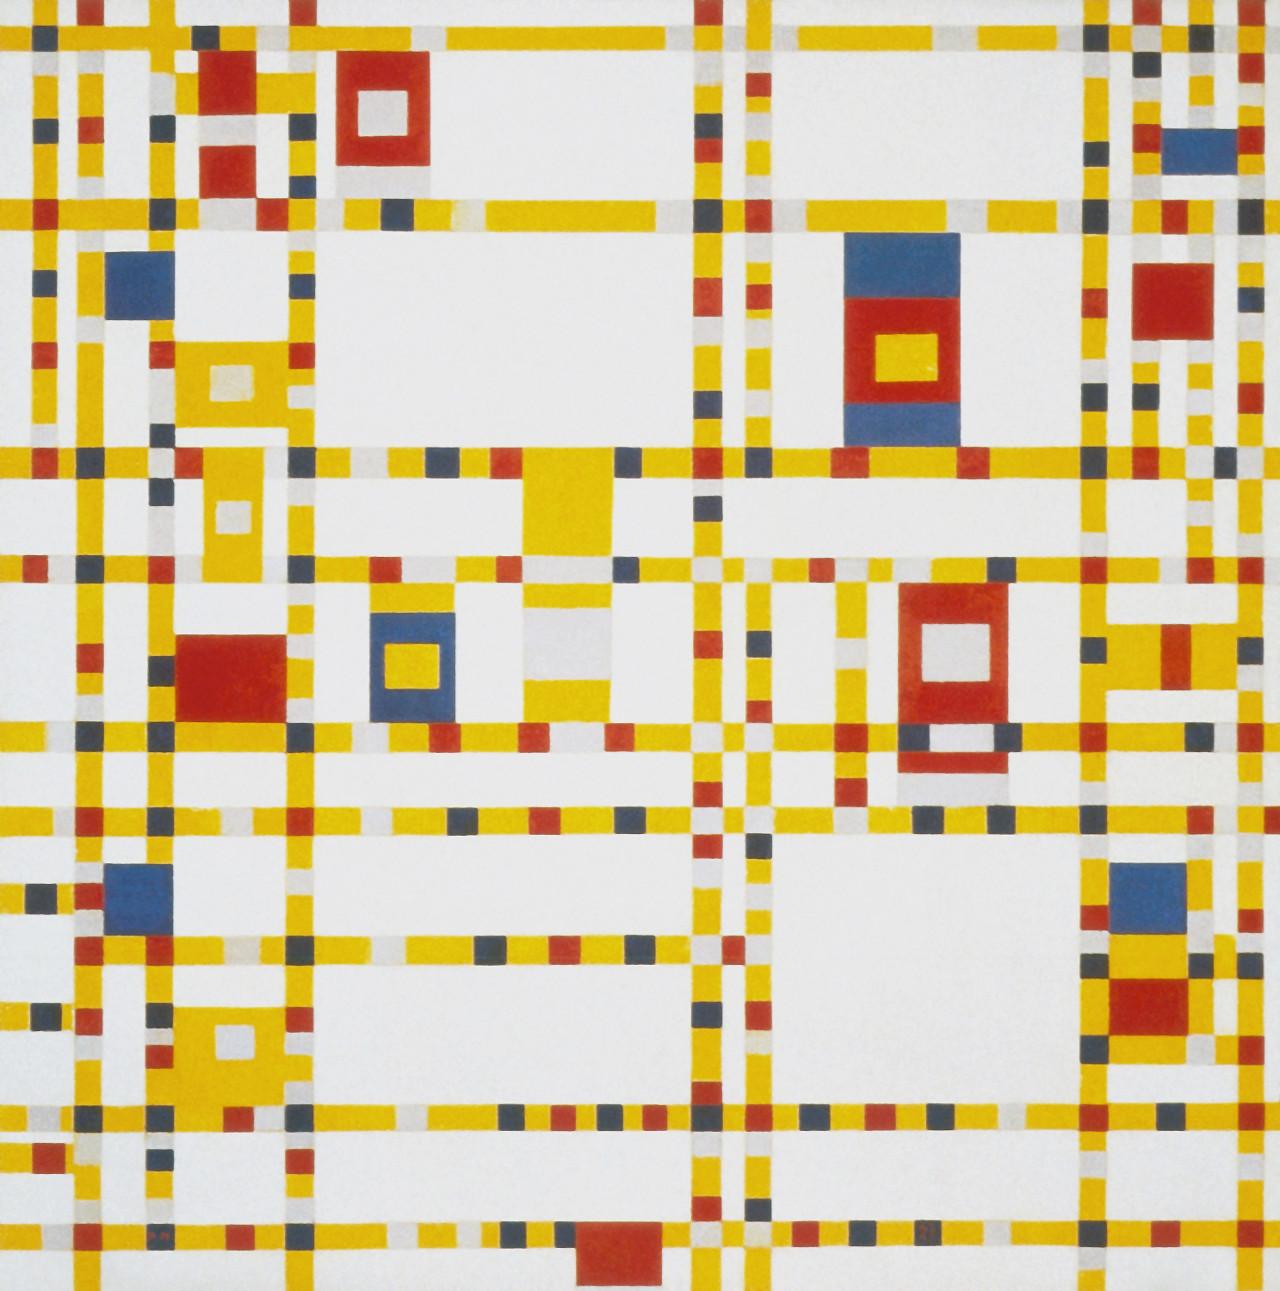 'Broadway Boogie-Woogie,' by Piet Mondrian: oil on canvas (1943)